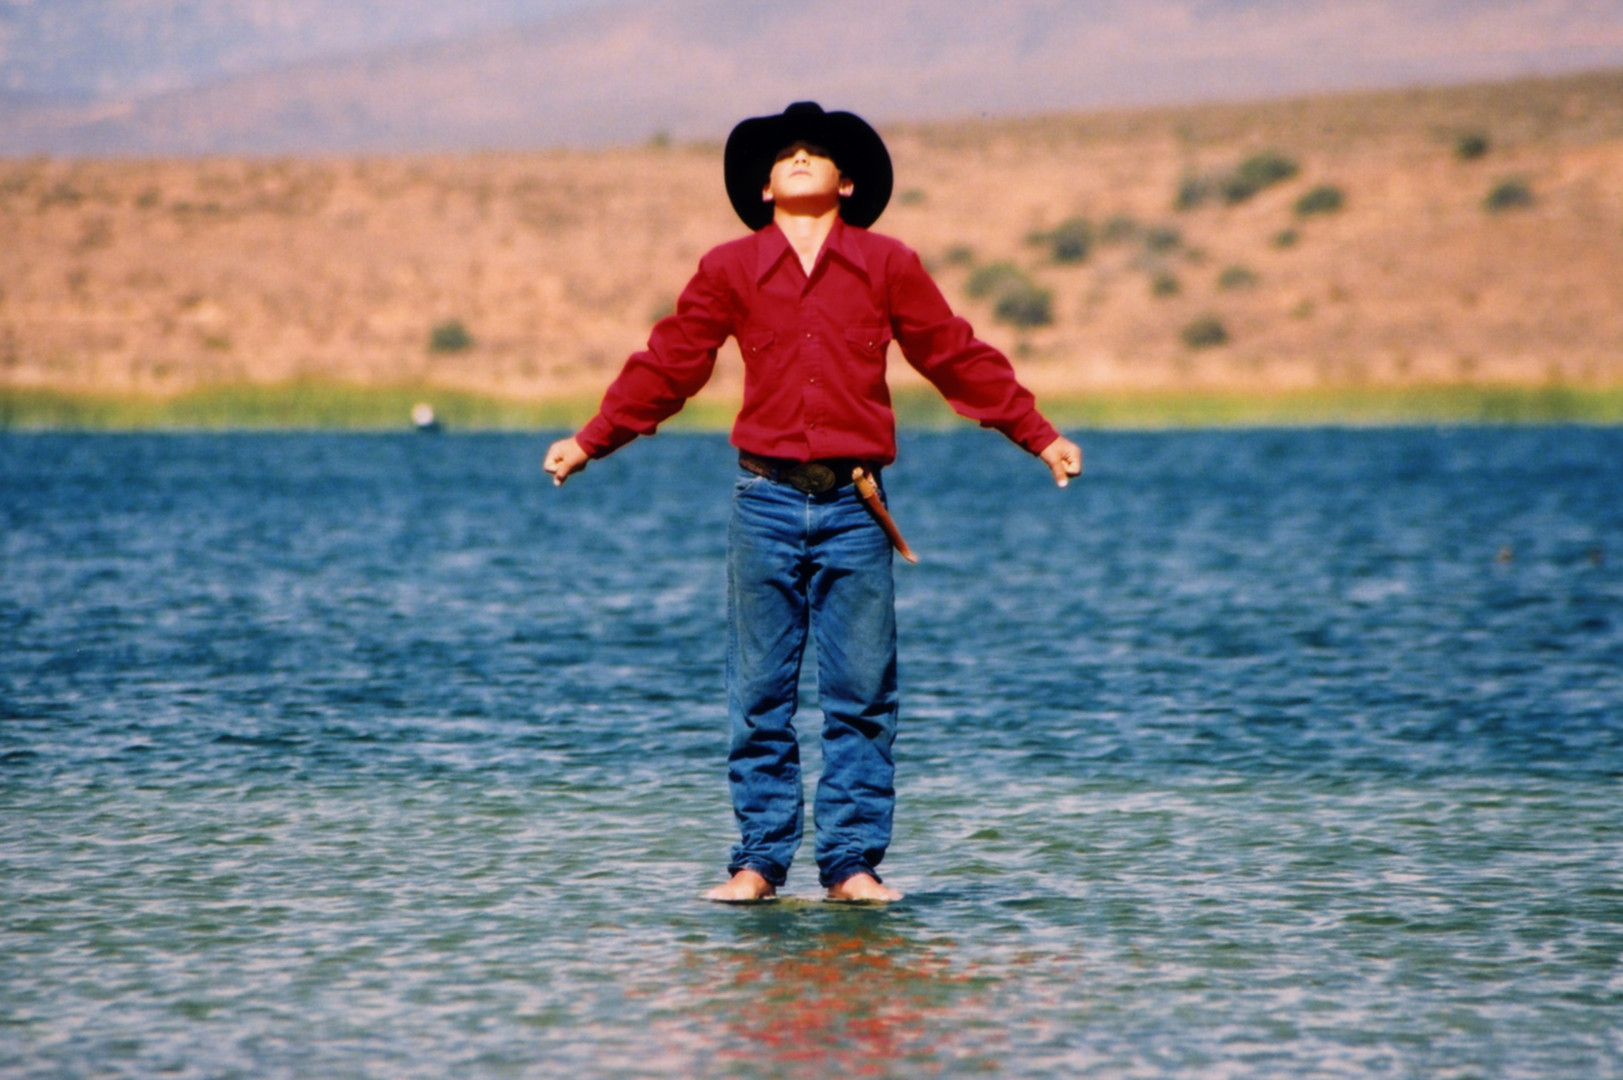 Searchlight Billy on water closeupHQ.jpg